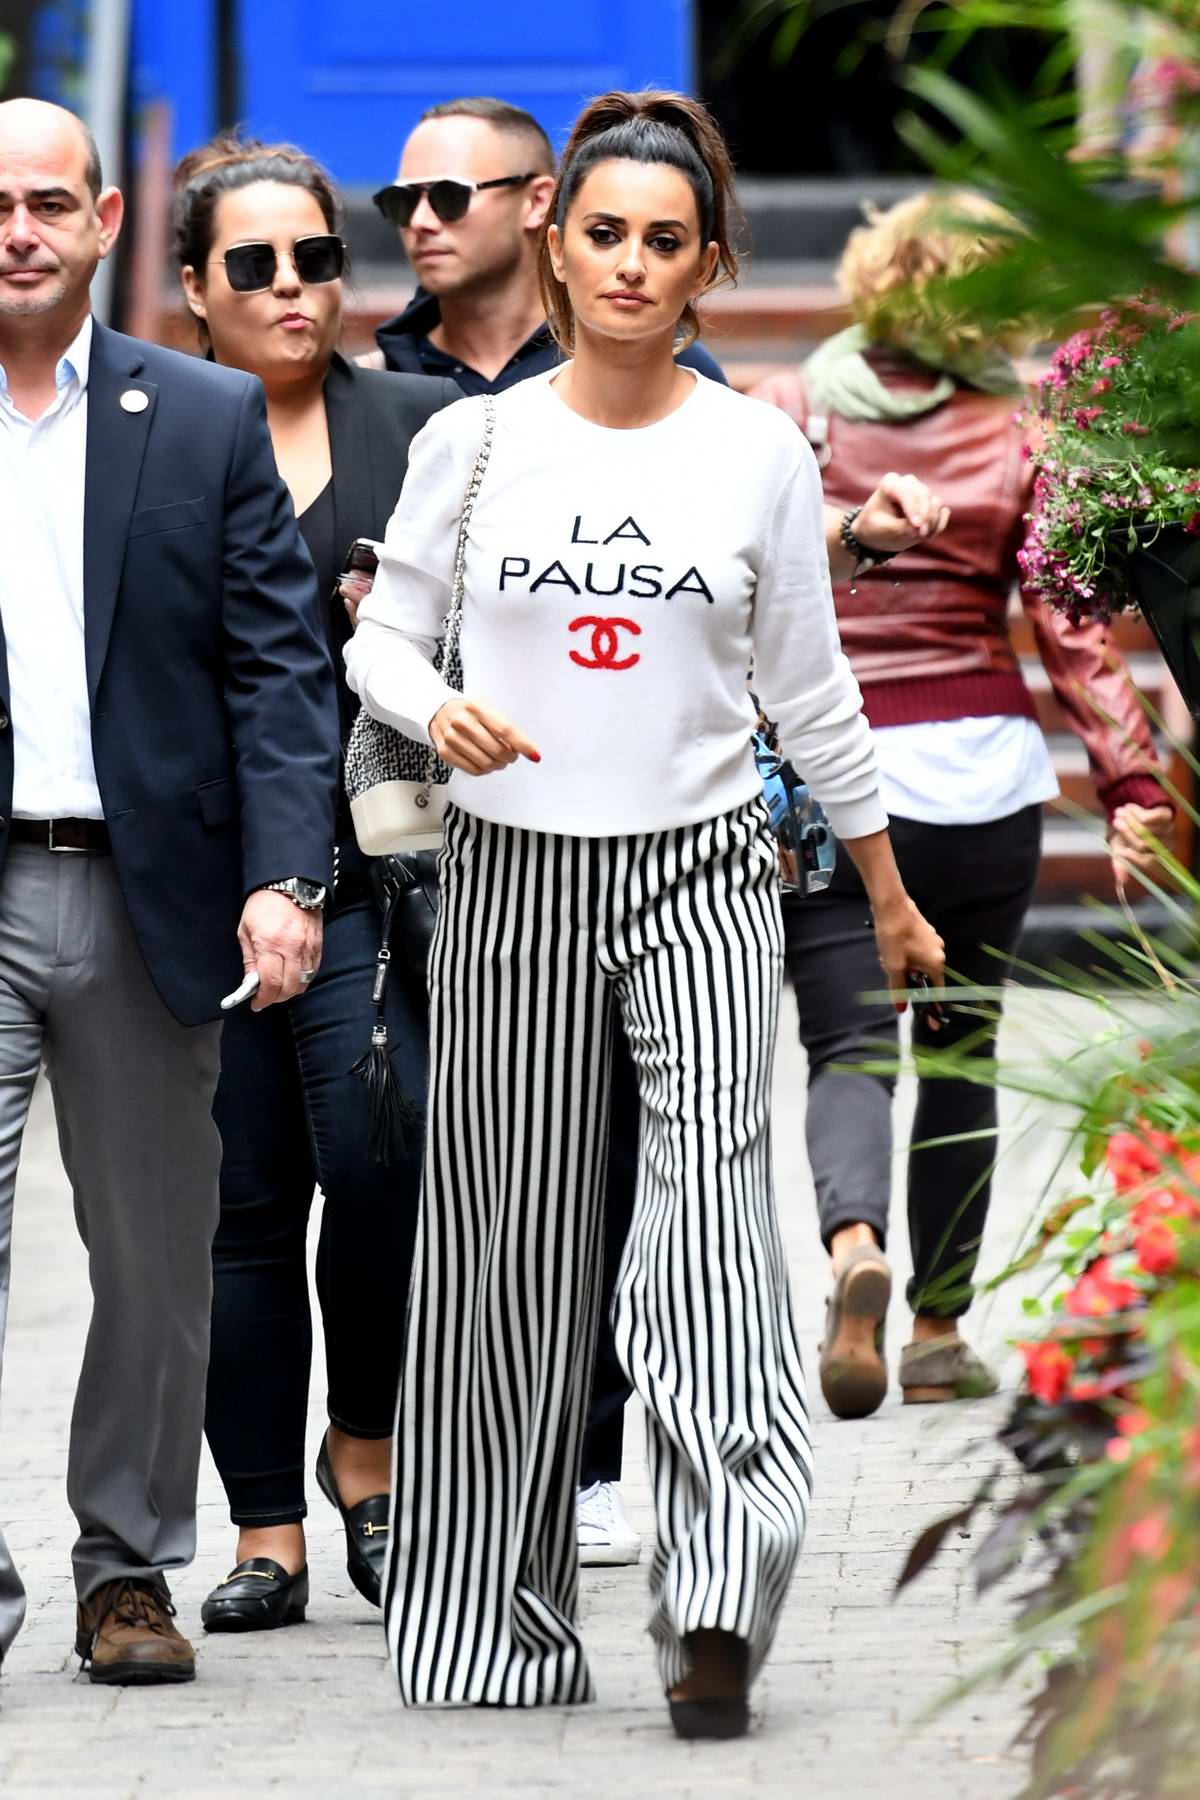 Penelope Cruz Seen Wearing Chanel Sweatshirt And Striped Pants While